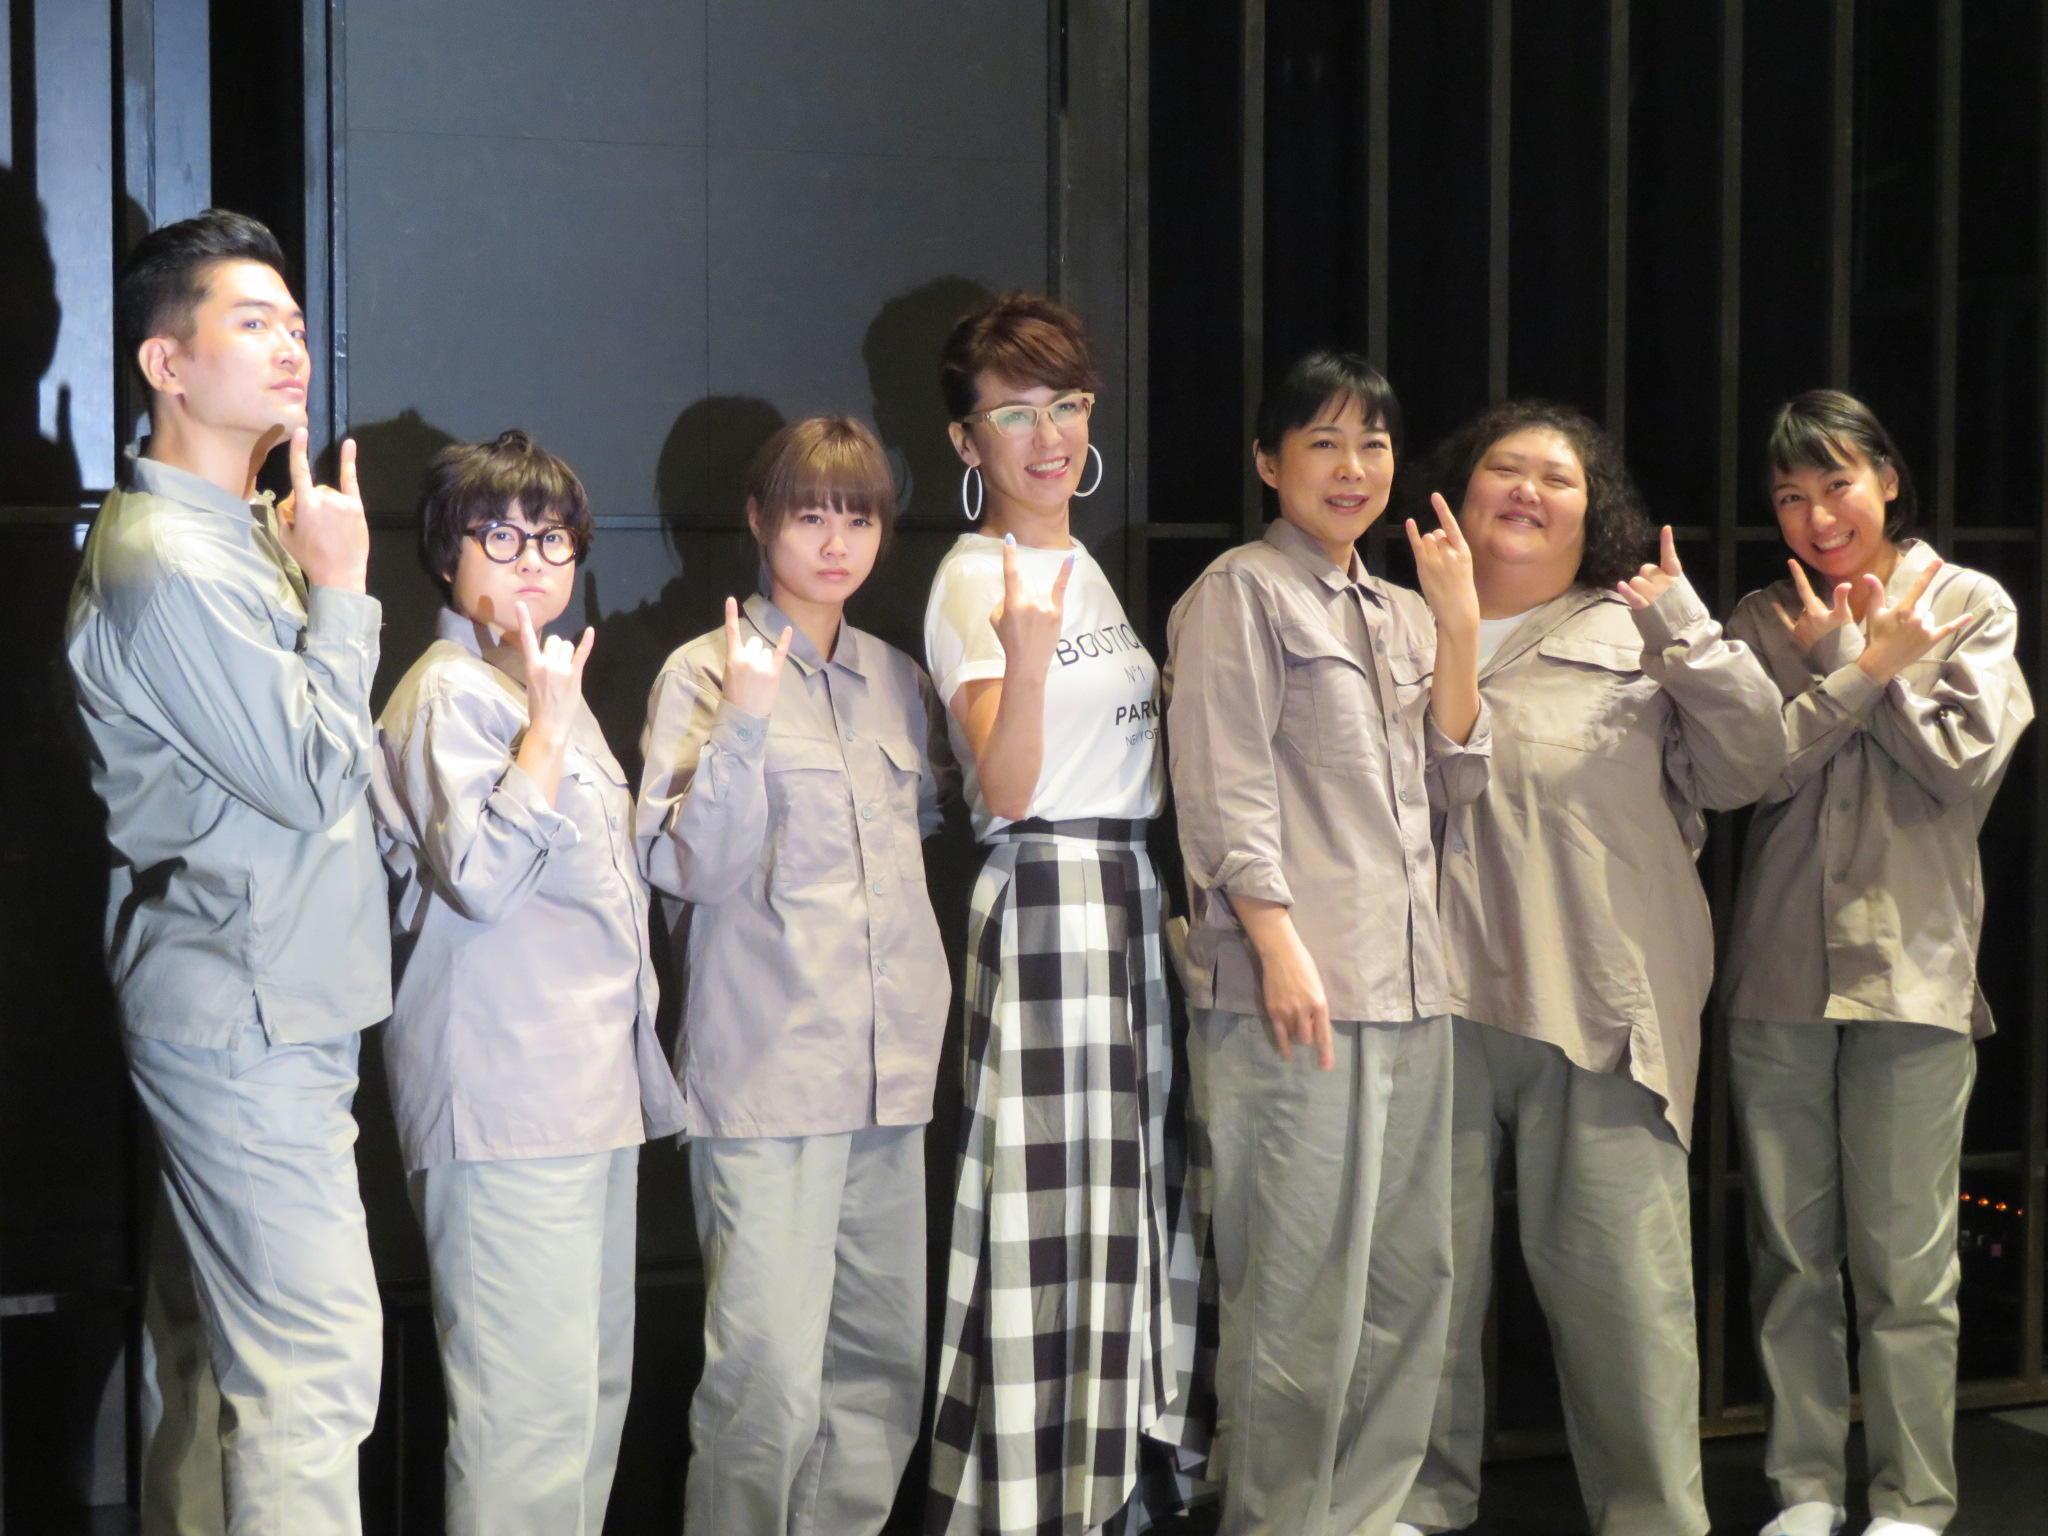 http://news.yoshimoto.co.jp/20180830225147-7393480d125460605ddc8d7f35b65e57ea84f549.jpg